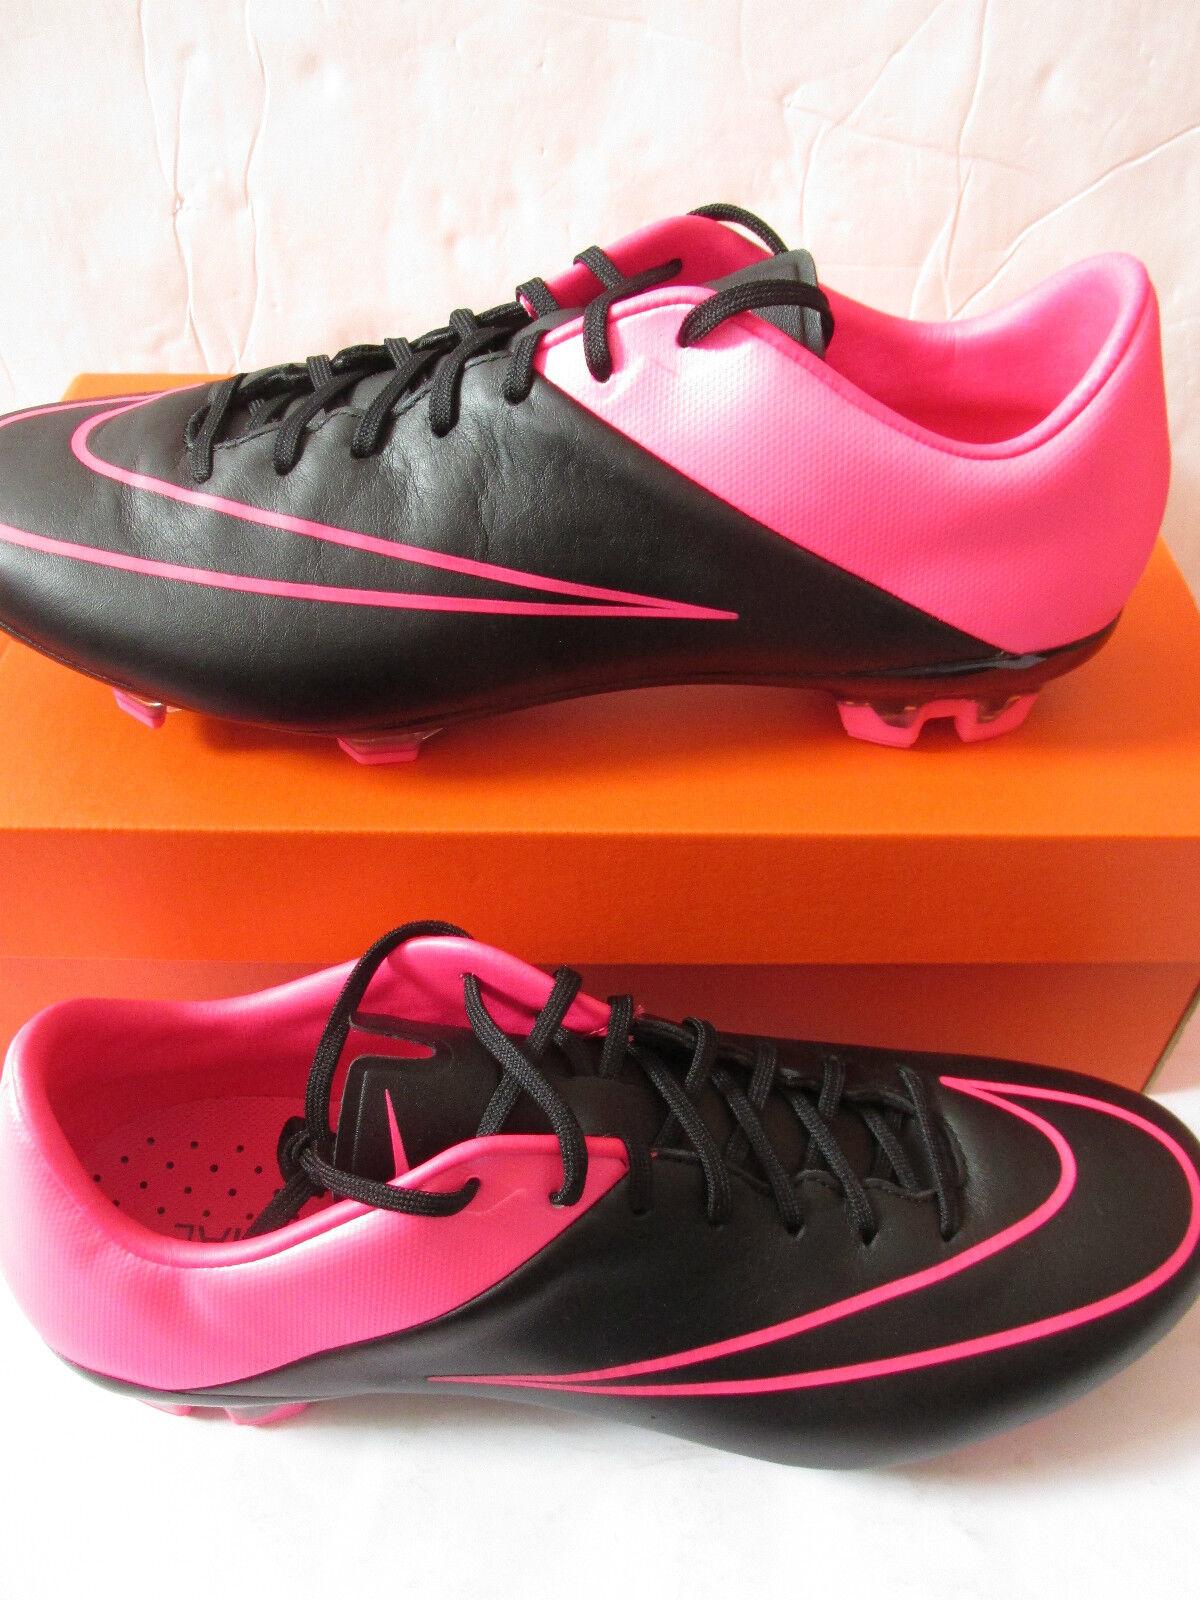 Nike Mercurial  Veloce II Lthr Fg Hombre botas de Fútbol 768808 006 Fútbol Tacos  directo de fábrica